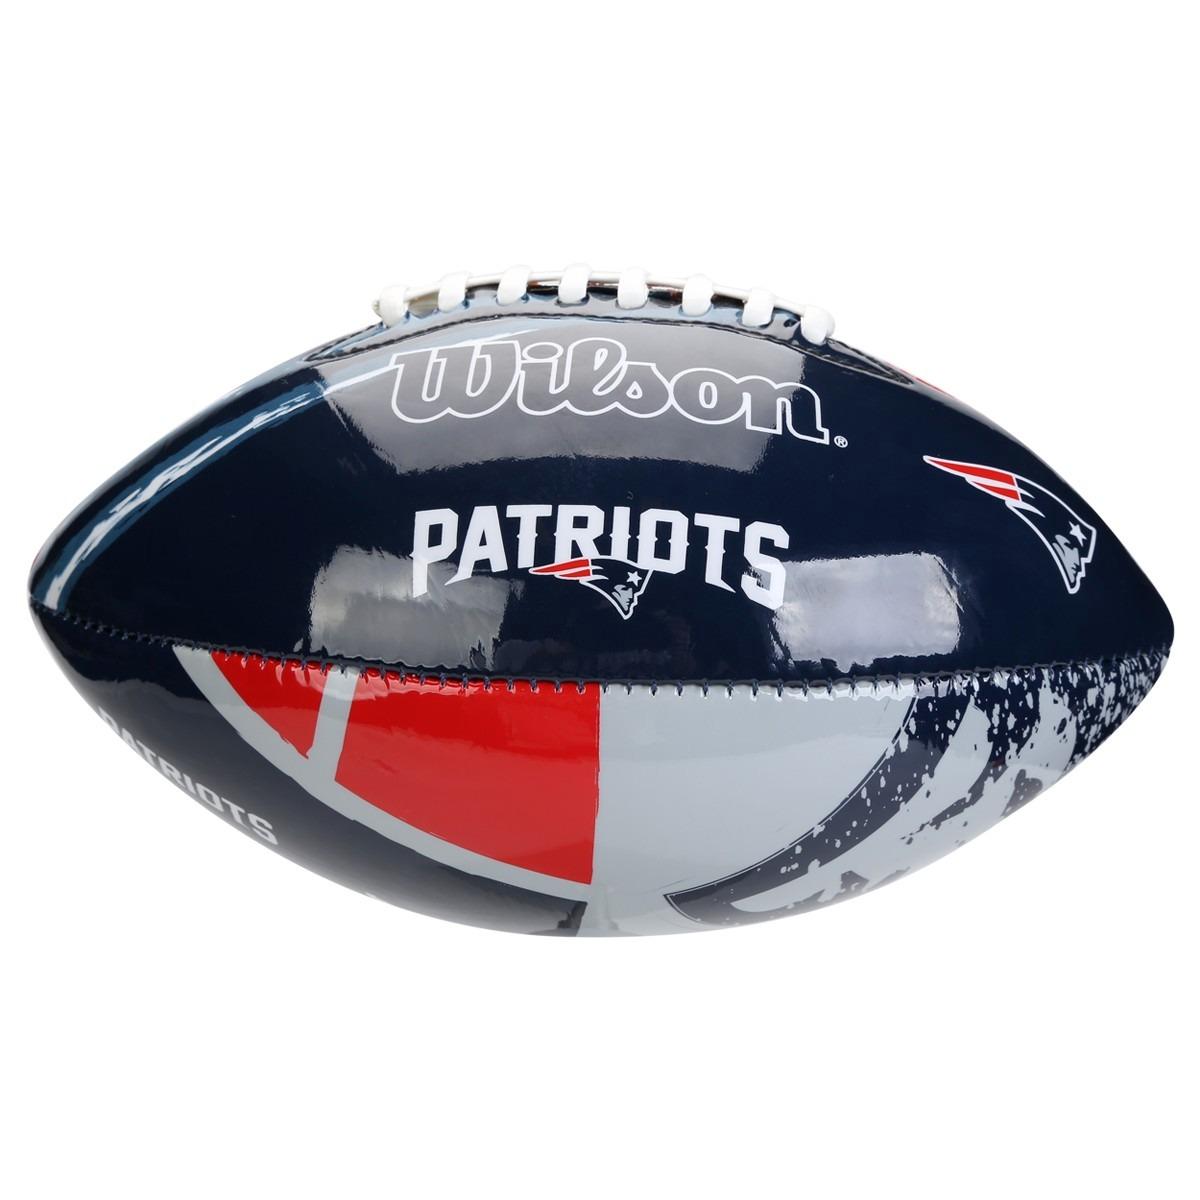 bola futebol americano wilson - nfl - new england patriots. Carregando  zoom... bola futebol americano. Carregando zoom. 7b6abc98522